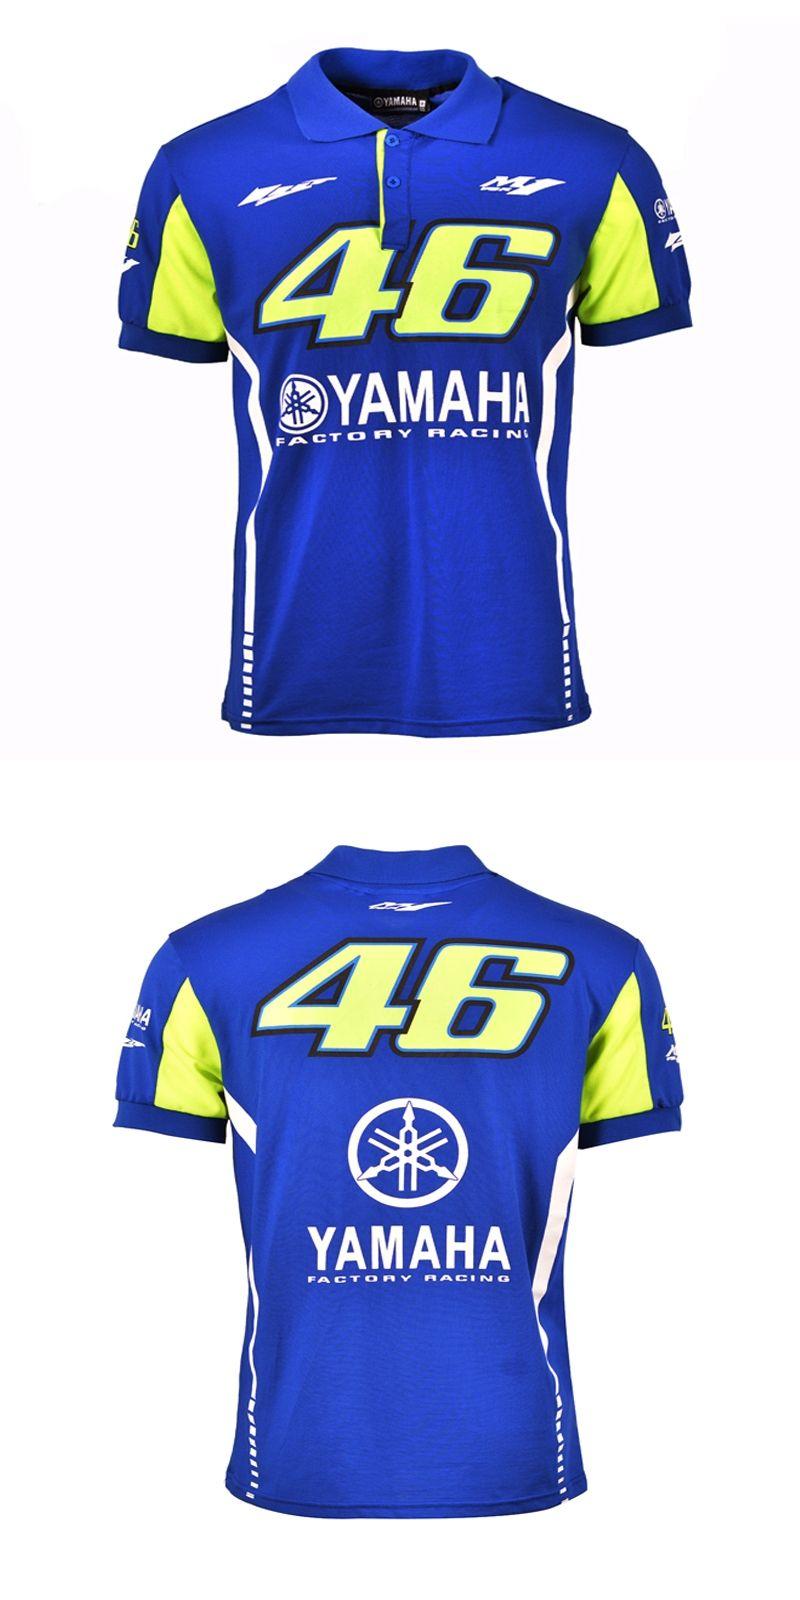 2017 Valentino Rossi Vr46 Racing Blue Motogp For Yamaha Polo Shirt